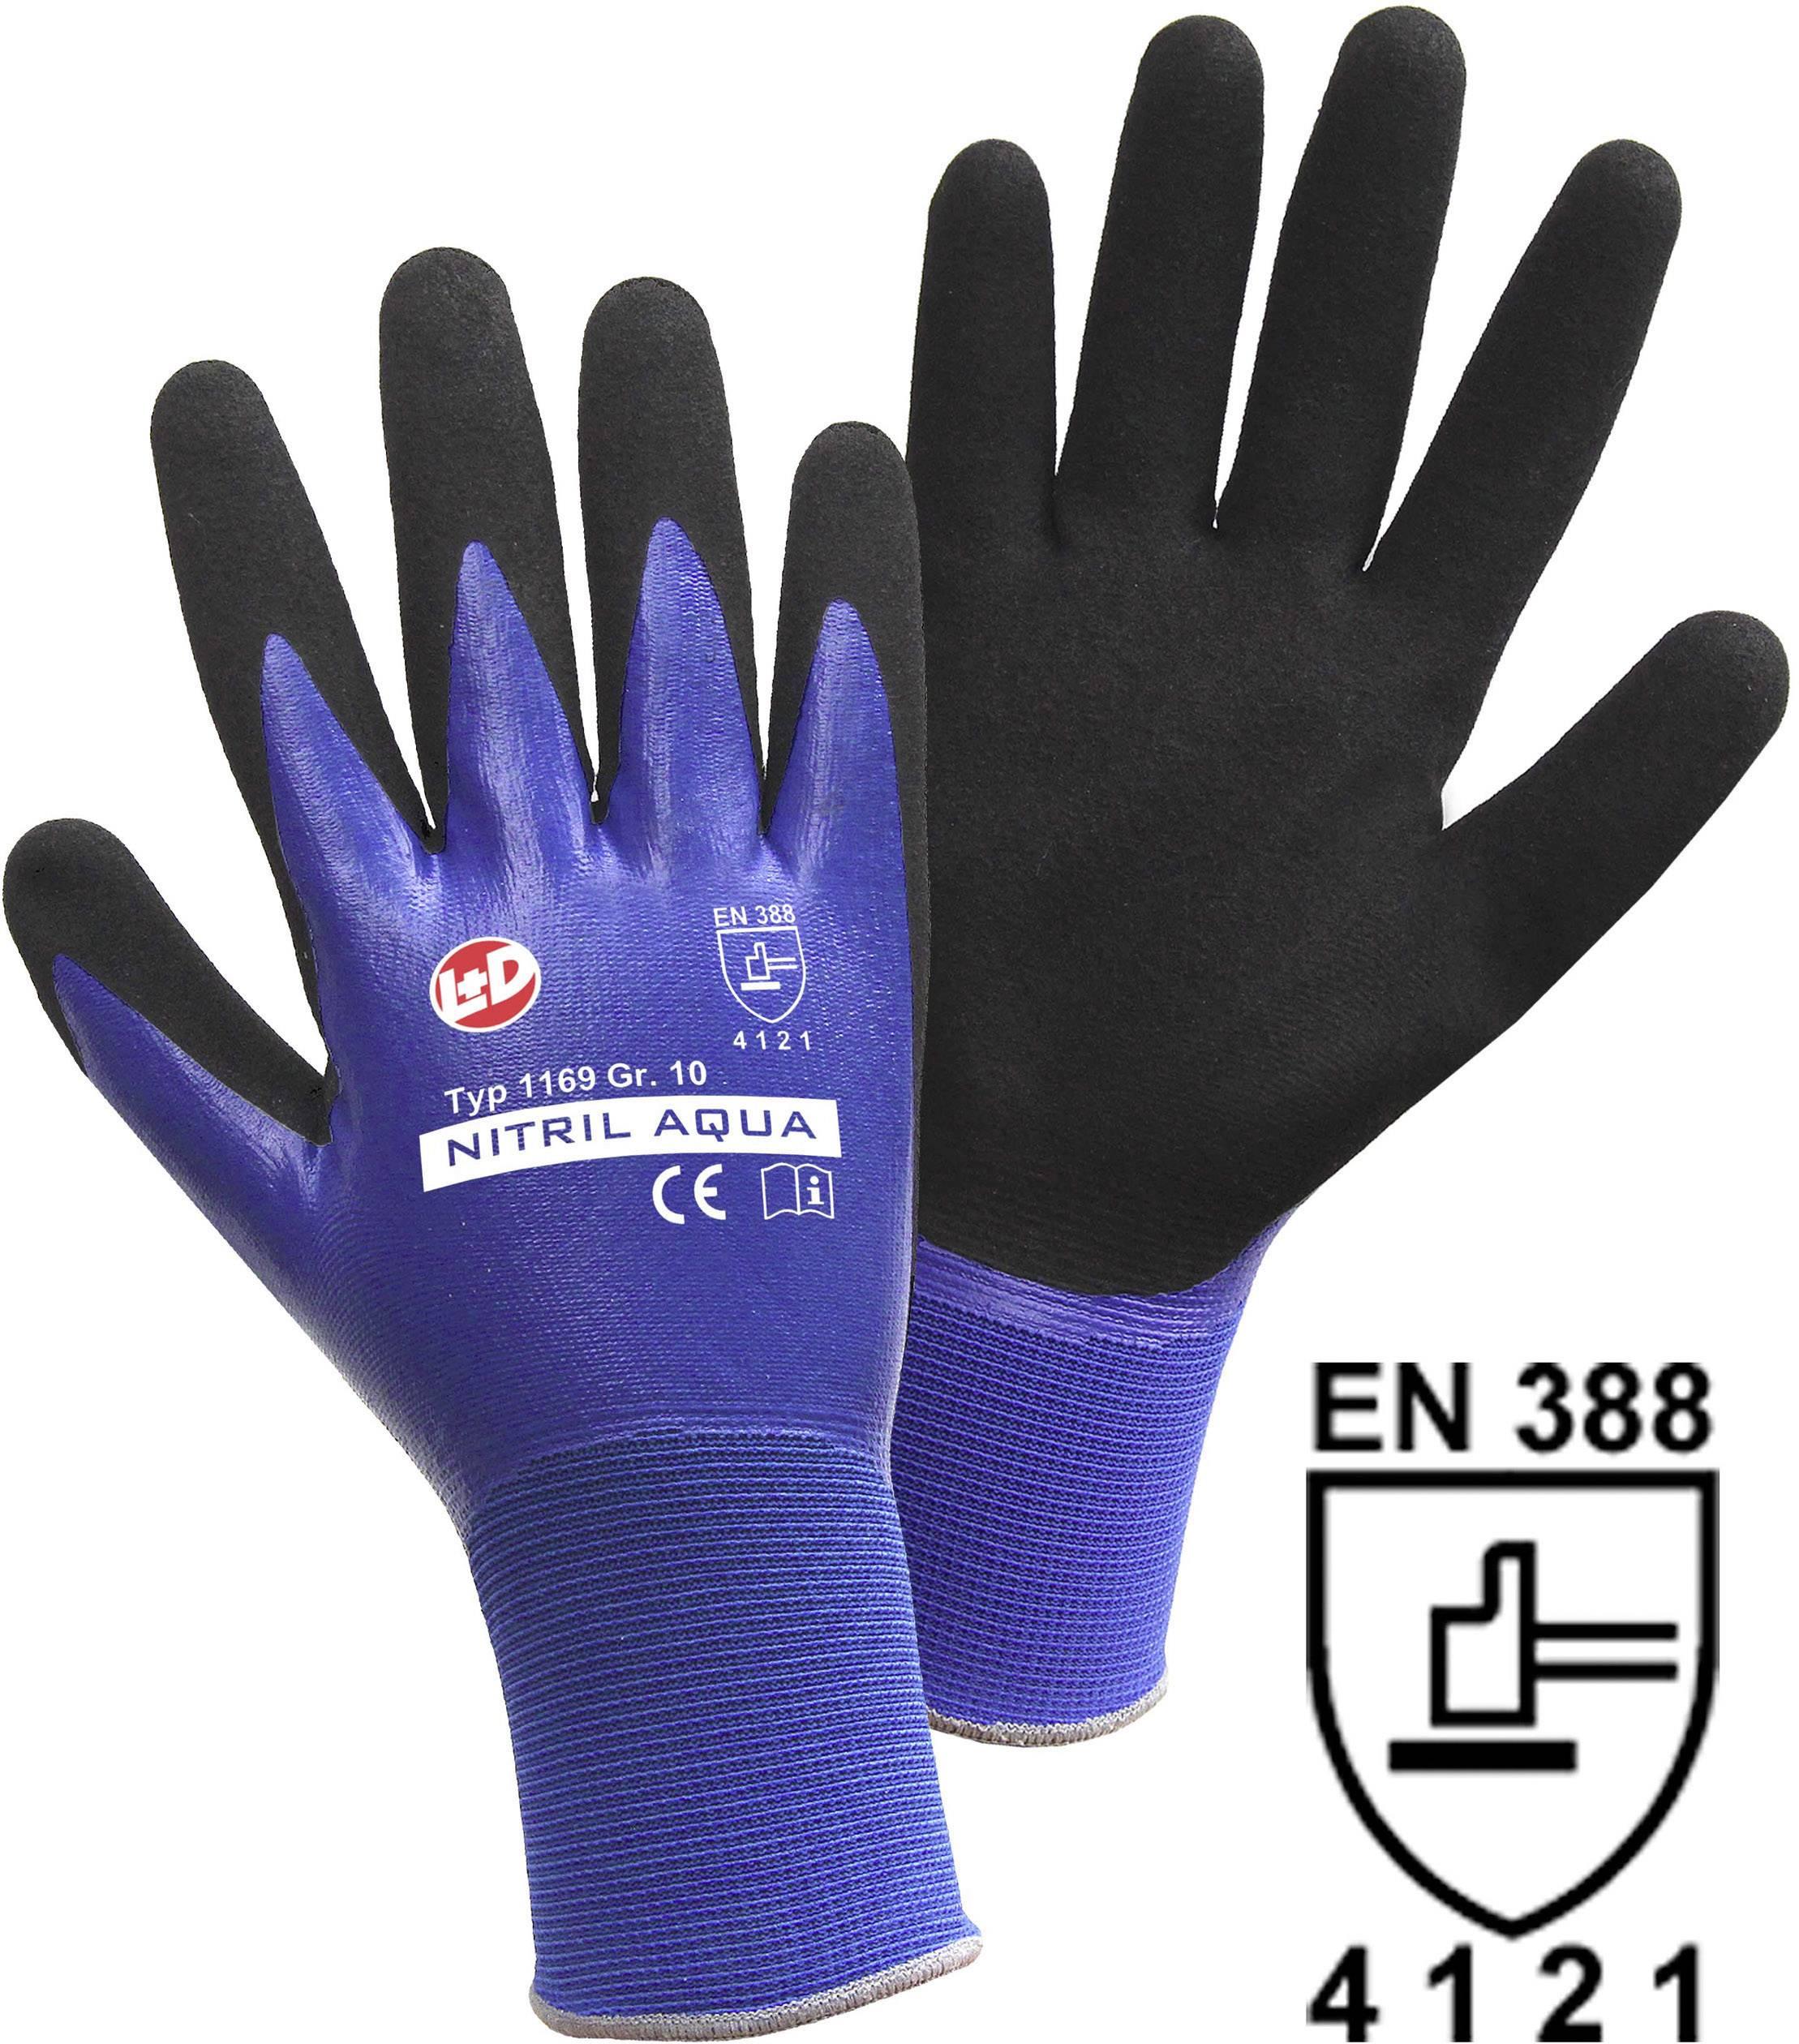 Pracovní rukavice L+D Nitril Aqua 1169, velikost rukavic: 9, L